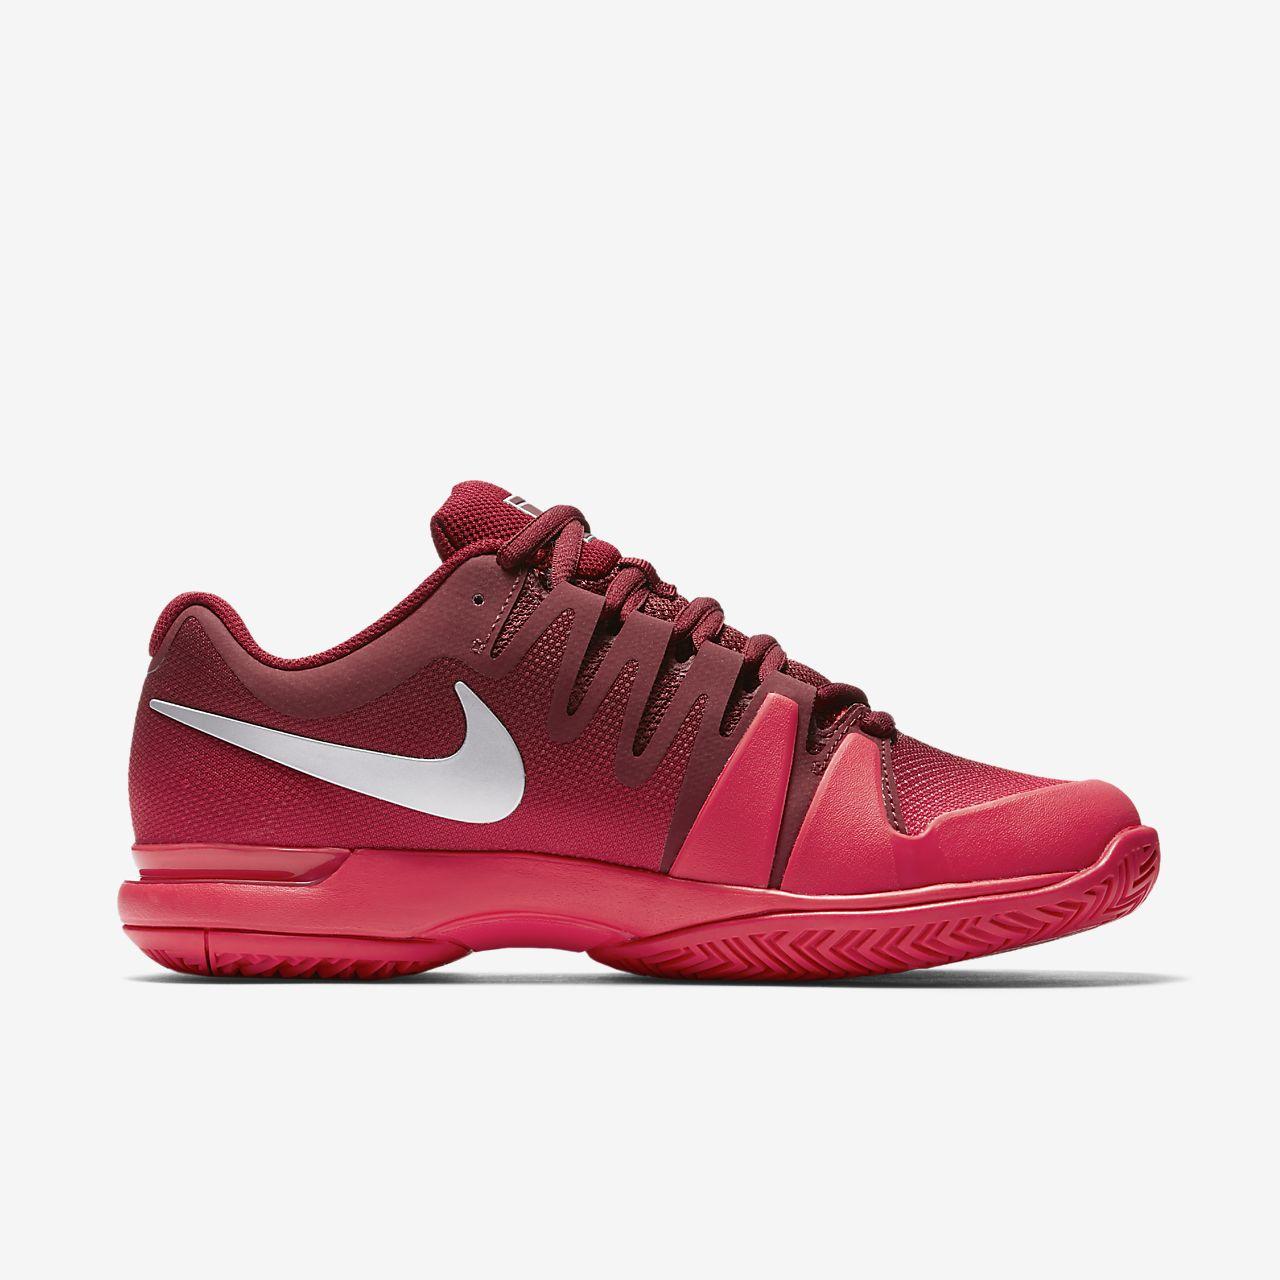 chaussures de tennis nike vapor 9.5 tour